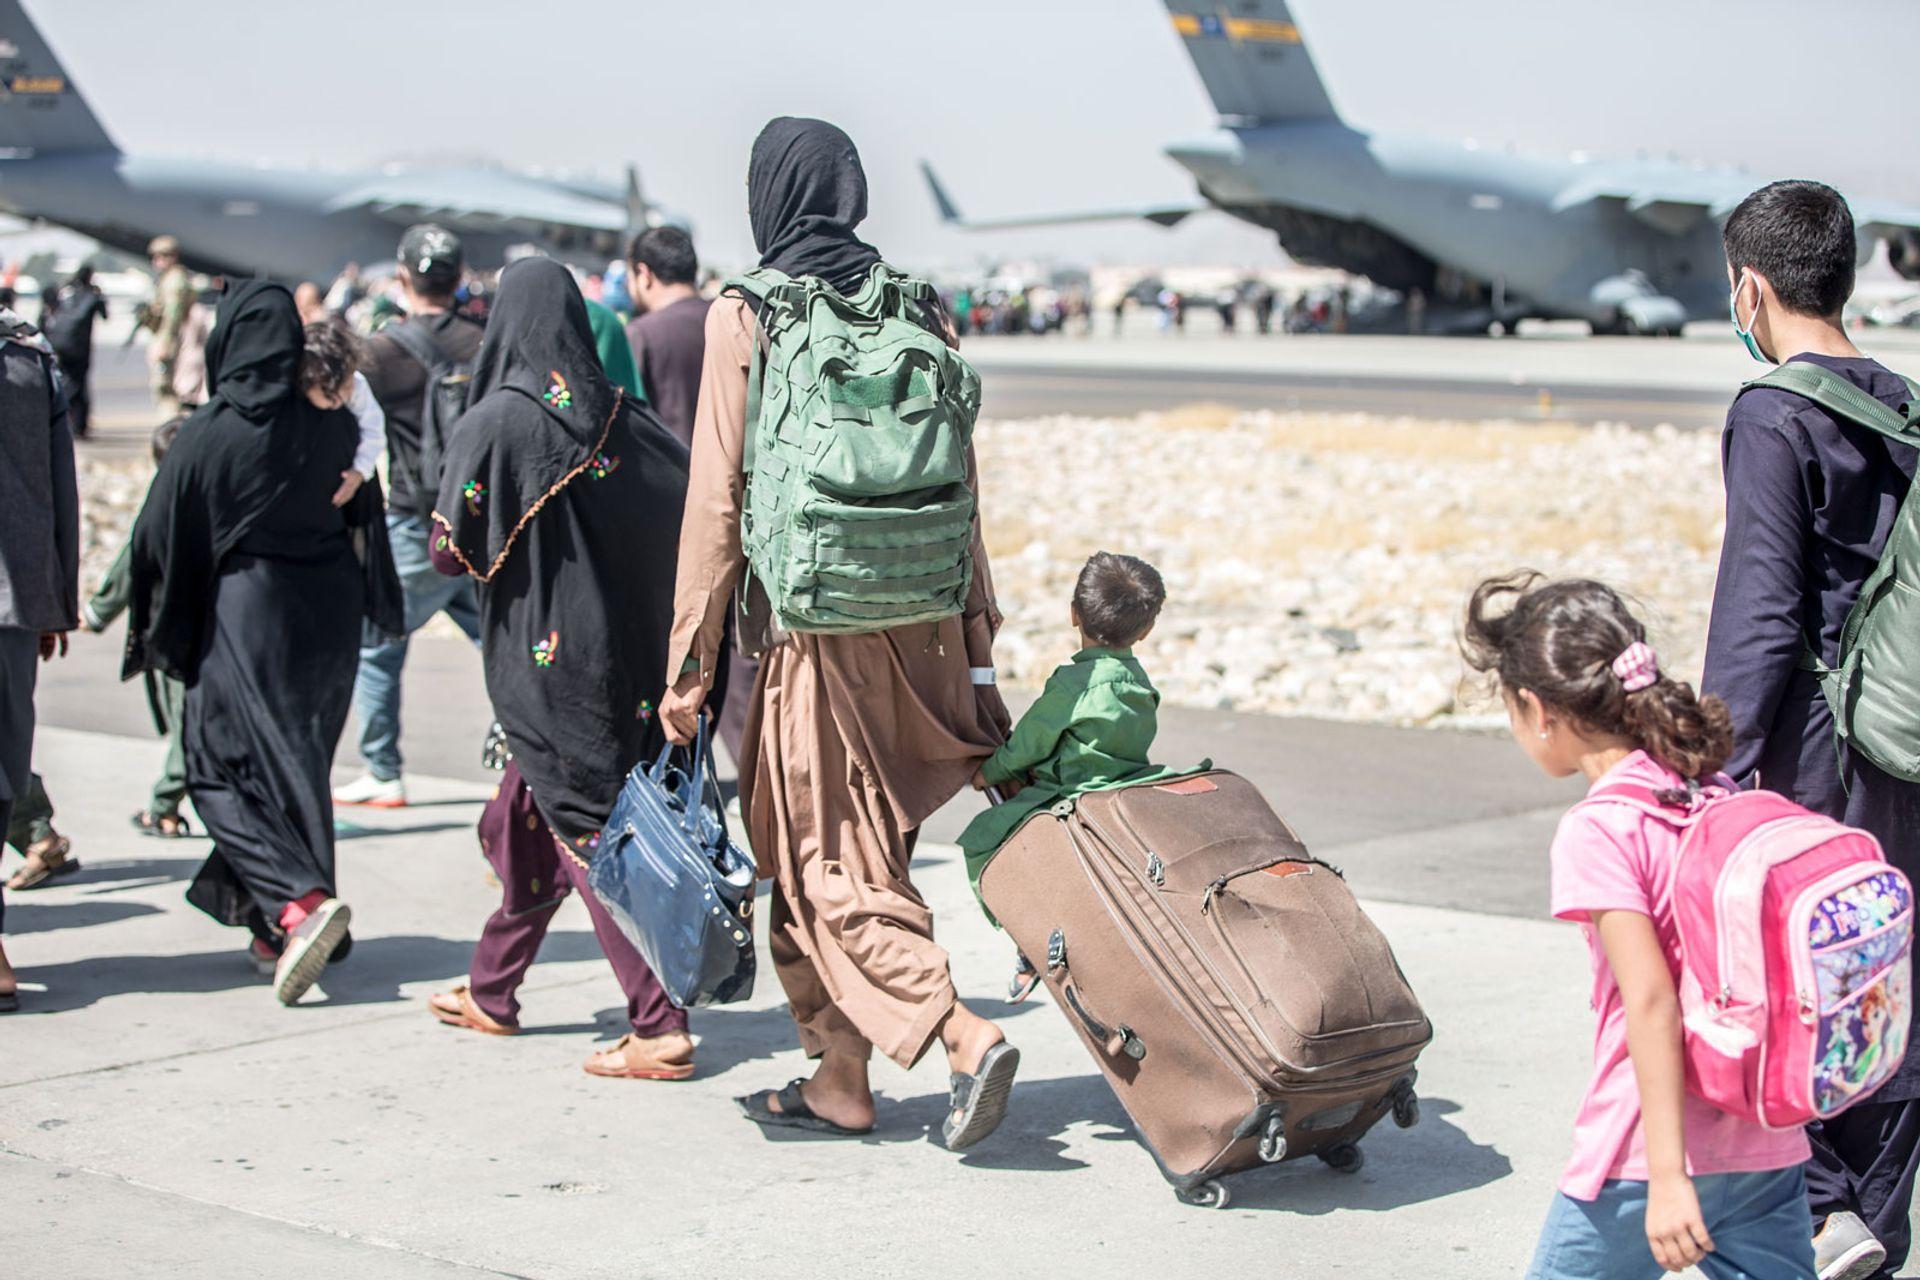 People being evacuated at Hamid Karzai International Airport in Kabul earlier this week Photo: cc U.S. Marine Corps; Sgt. Samuel Ruiz